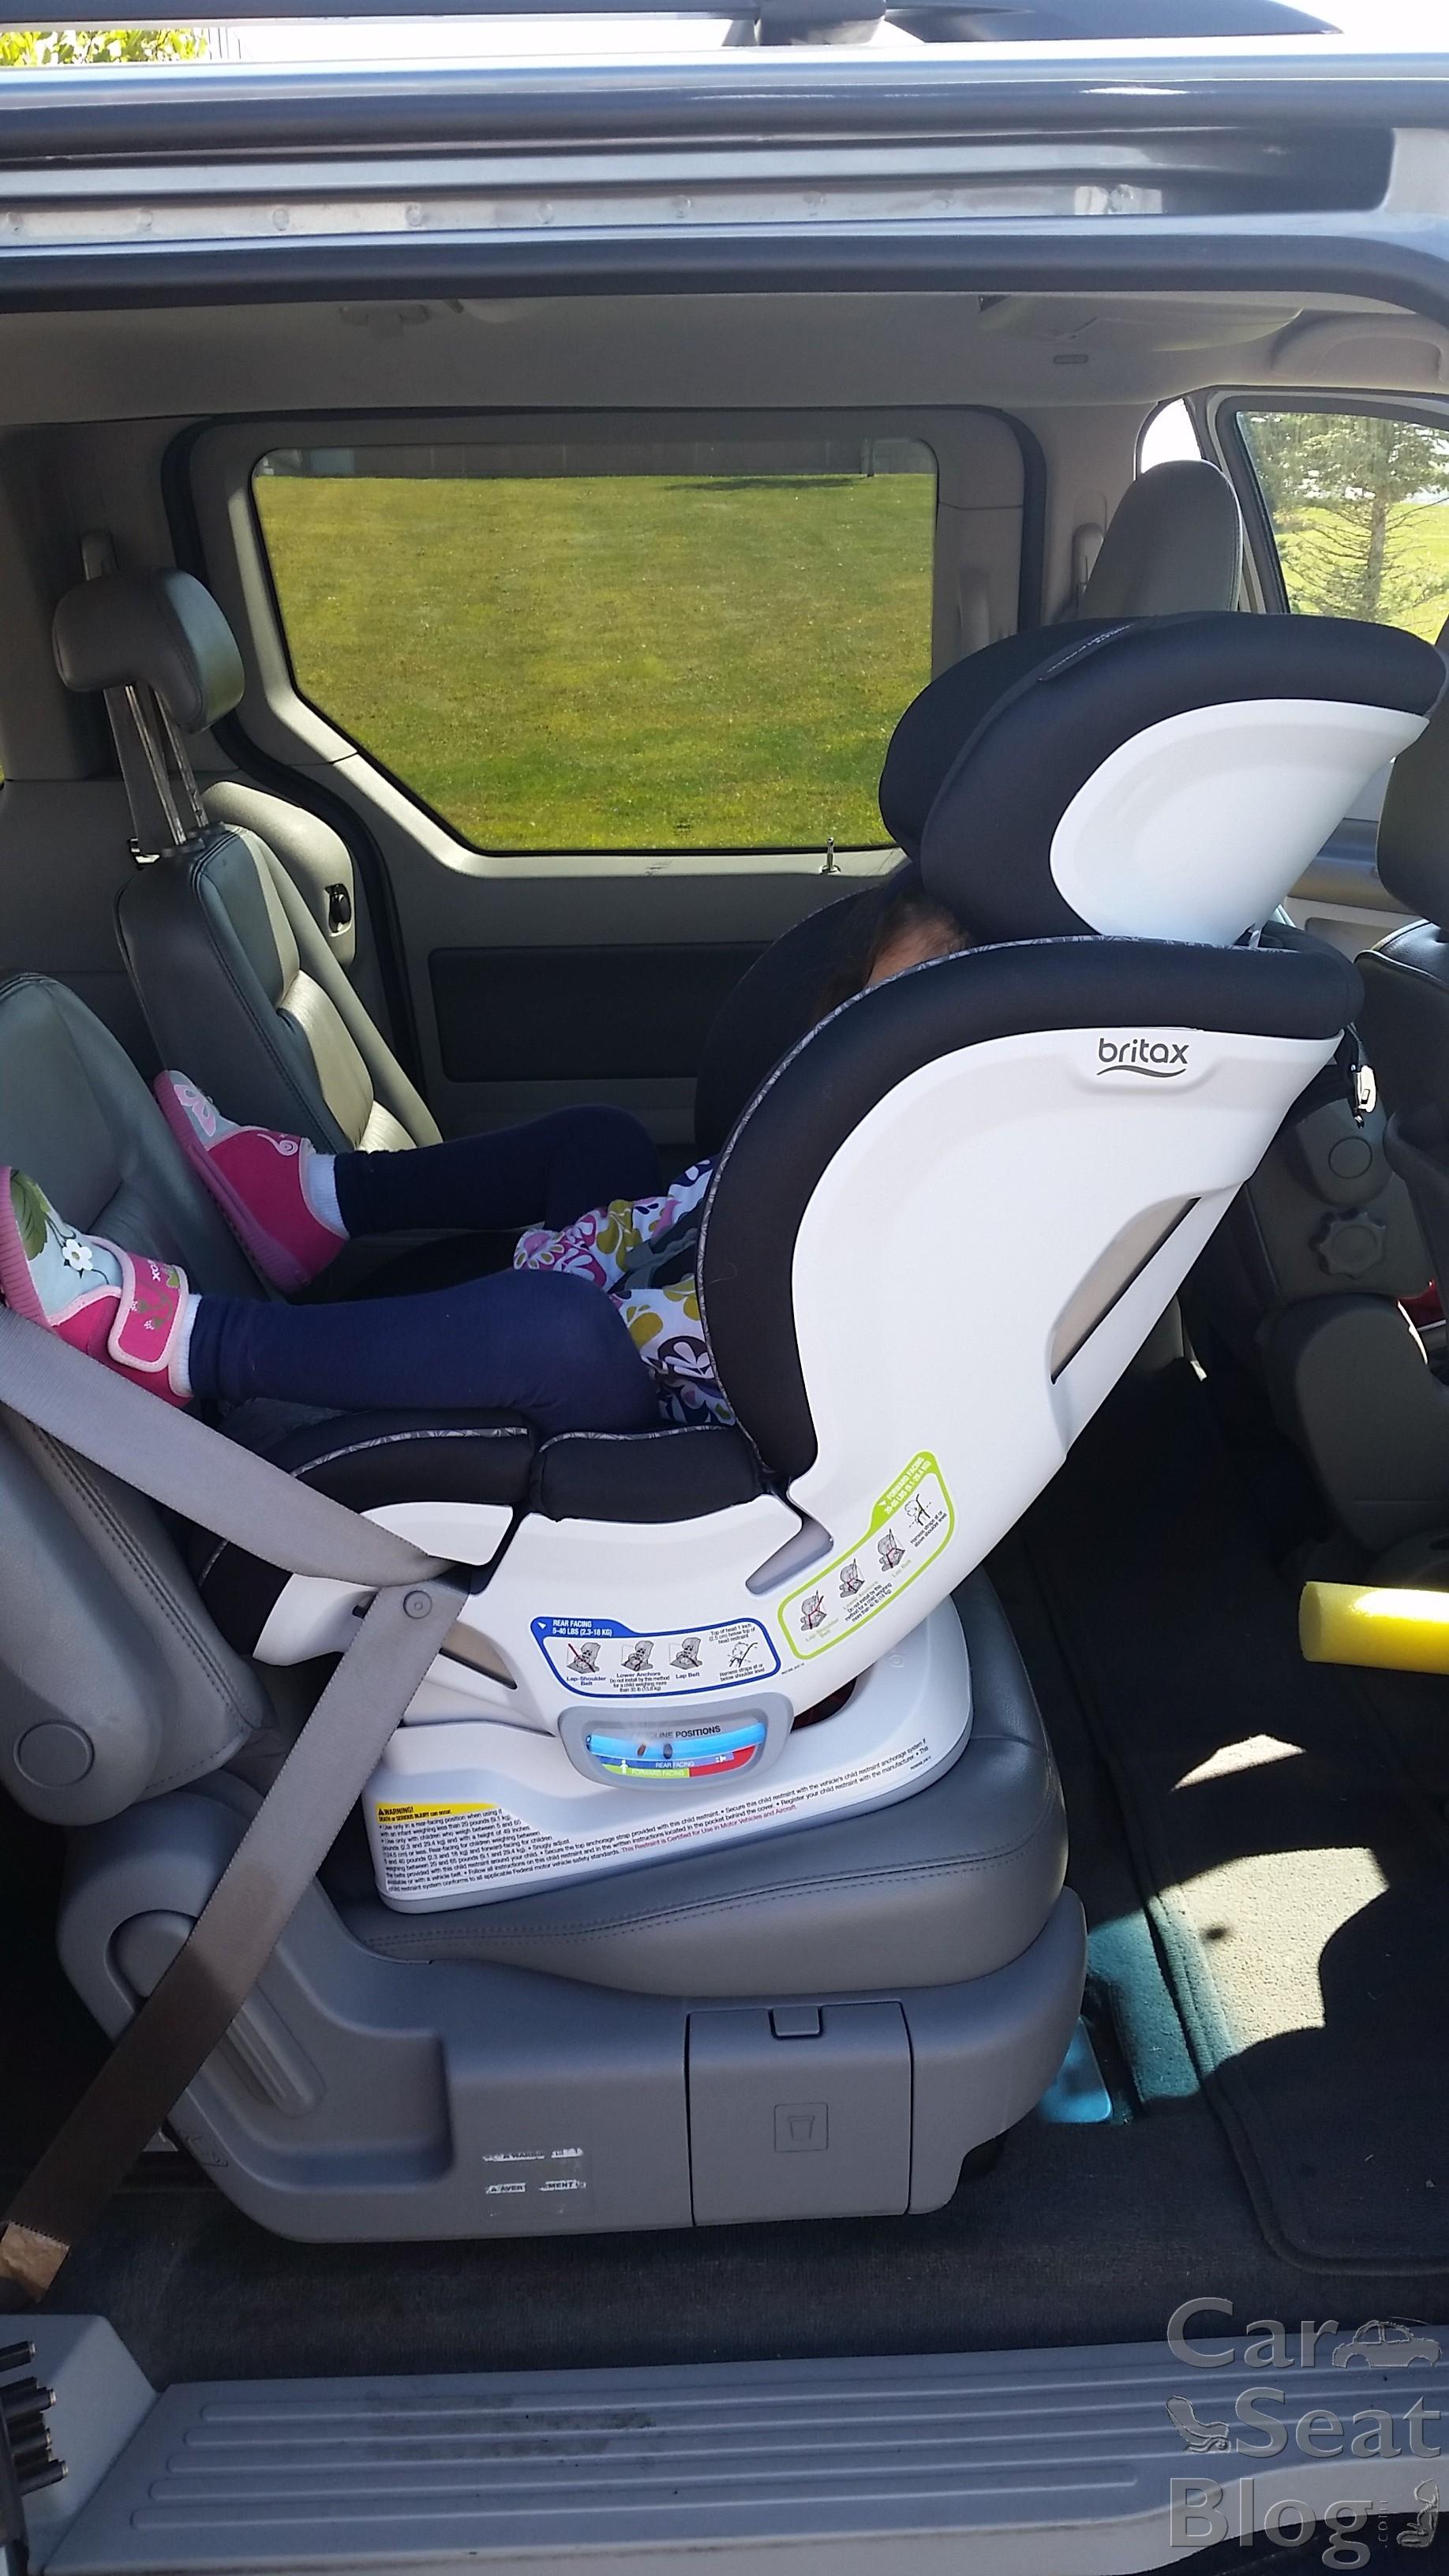 Britax Convertible Car Seat Forward Facing Installation ...